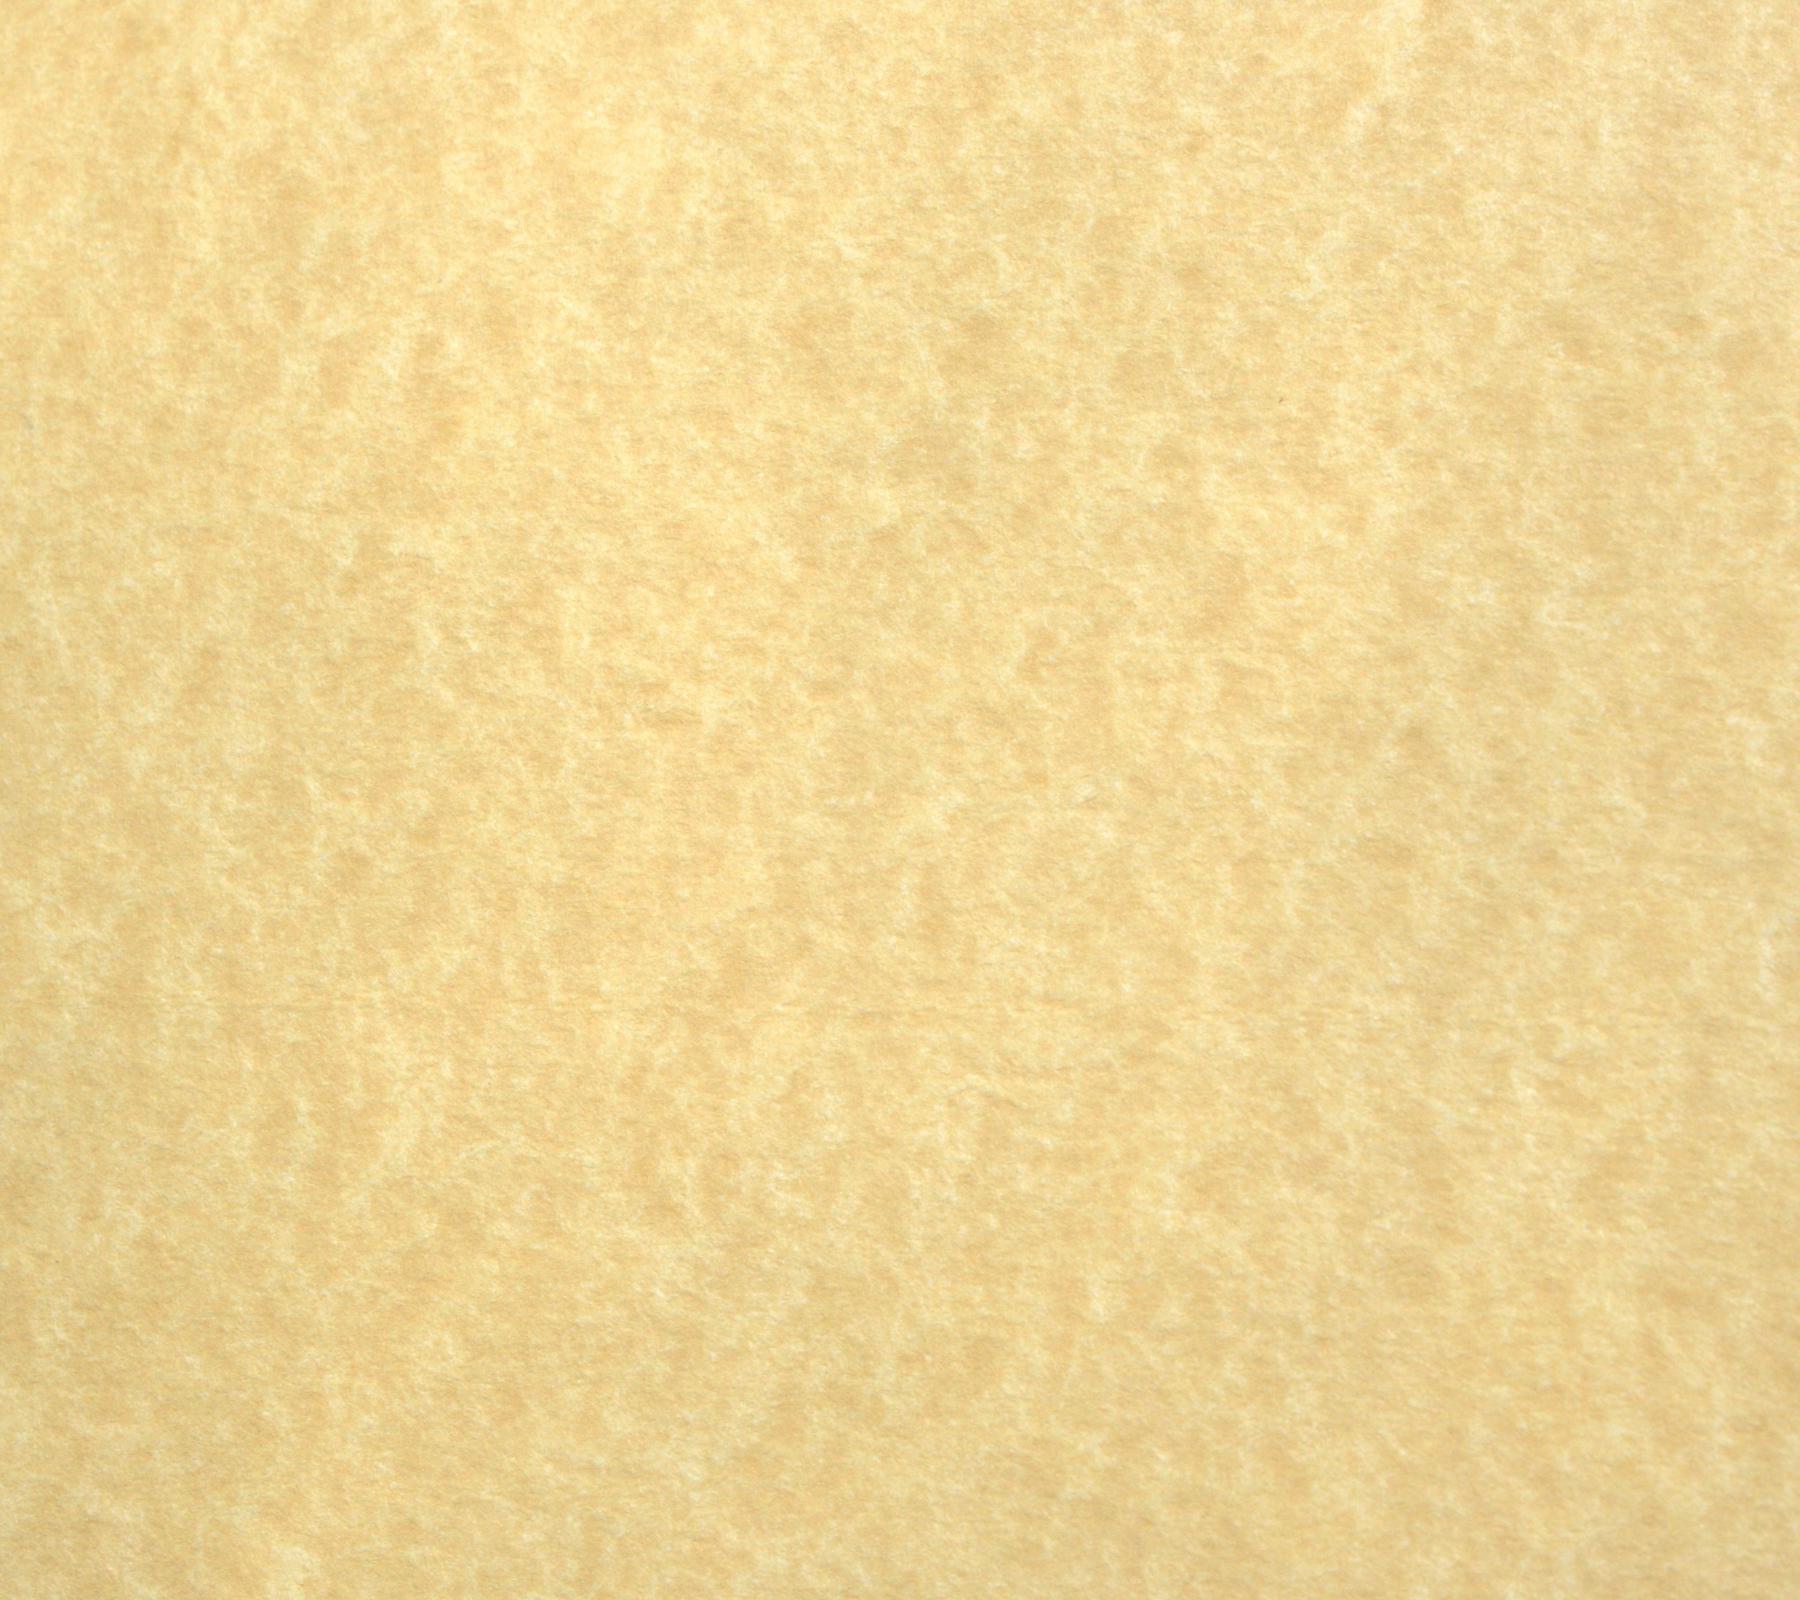 Parchment Paper Background 1800x1600 Background Image